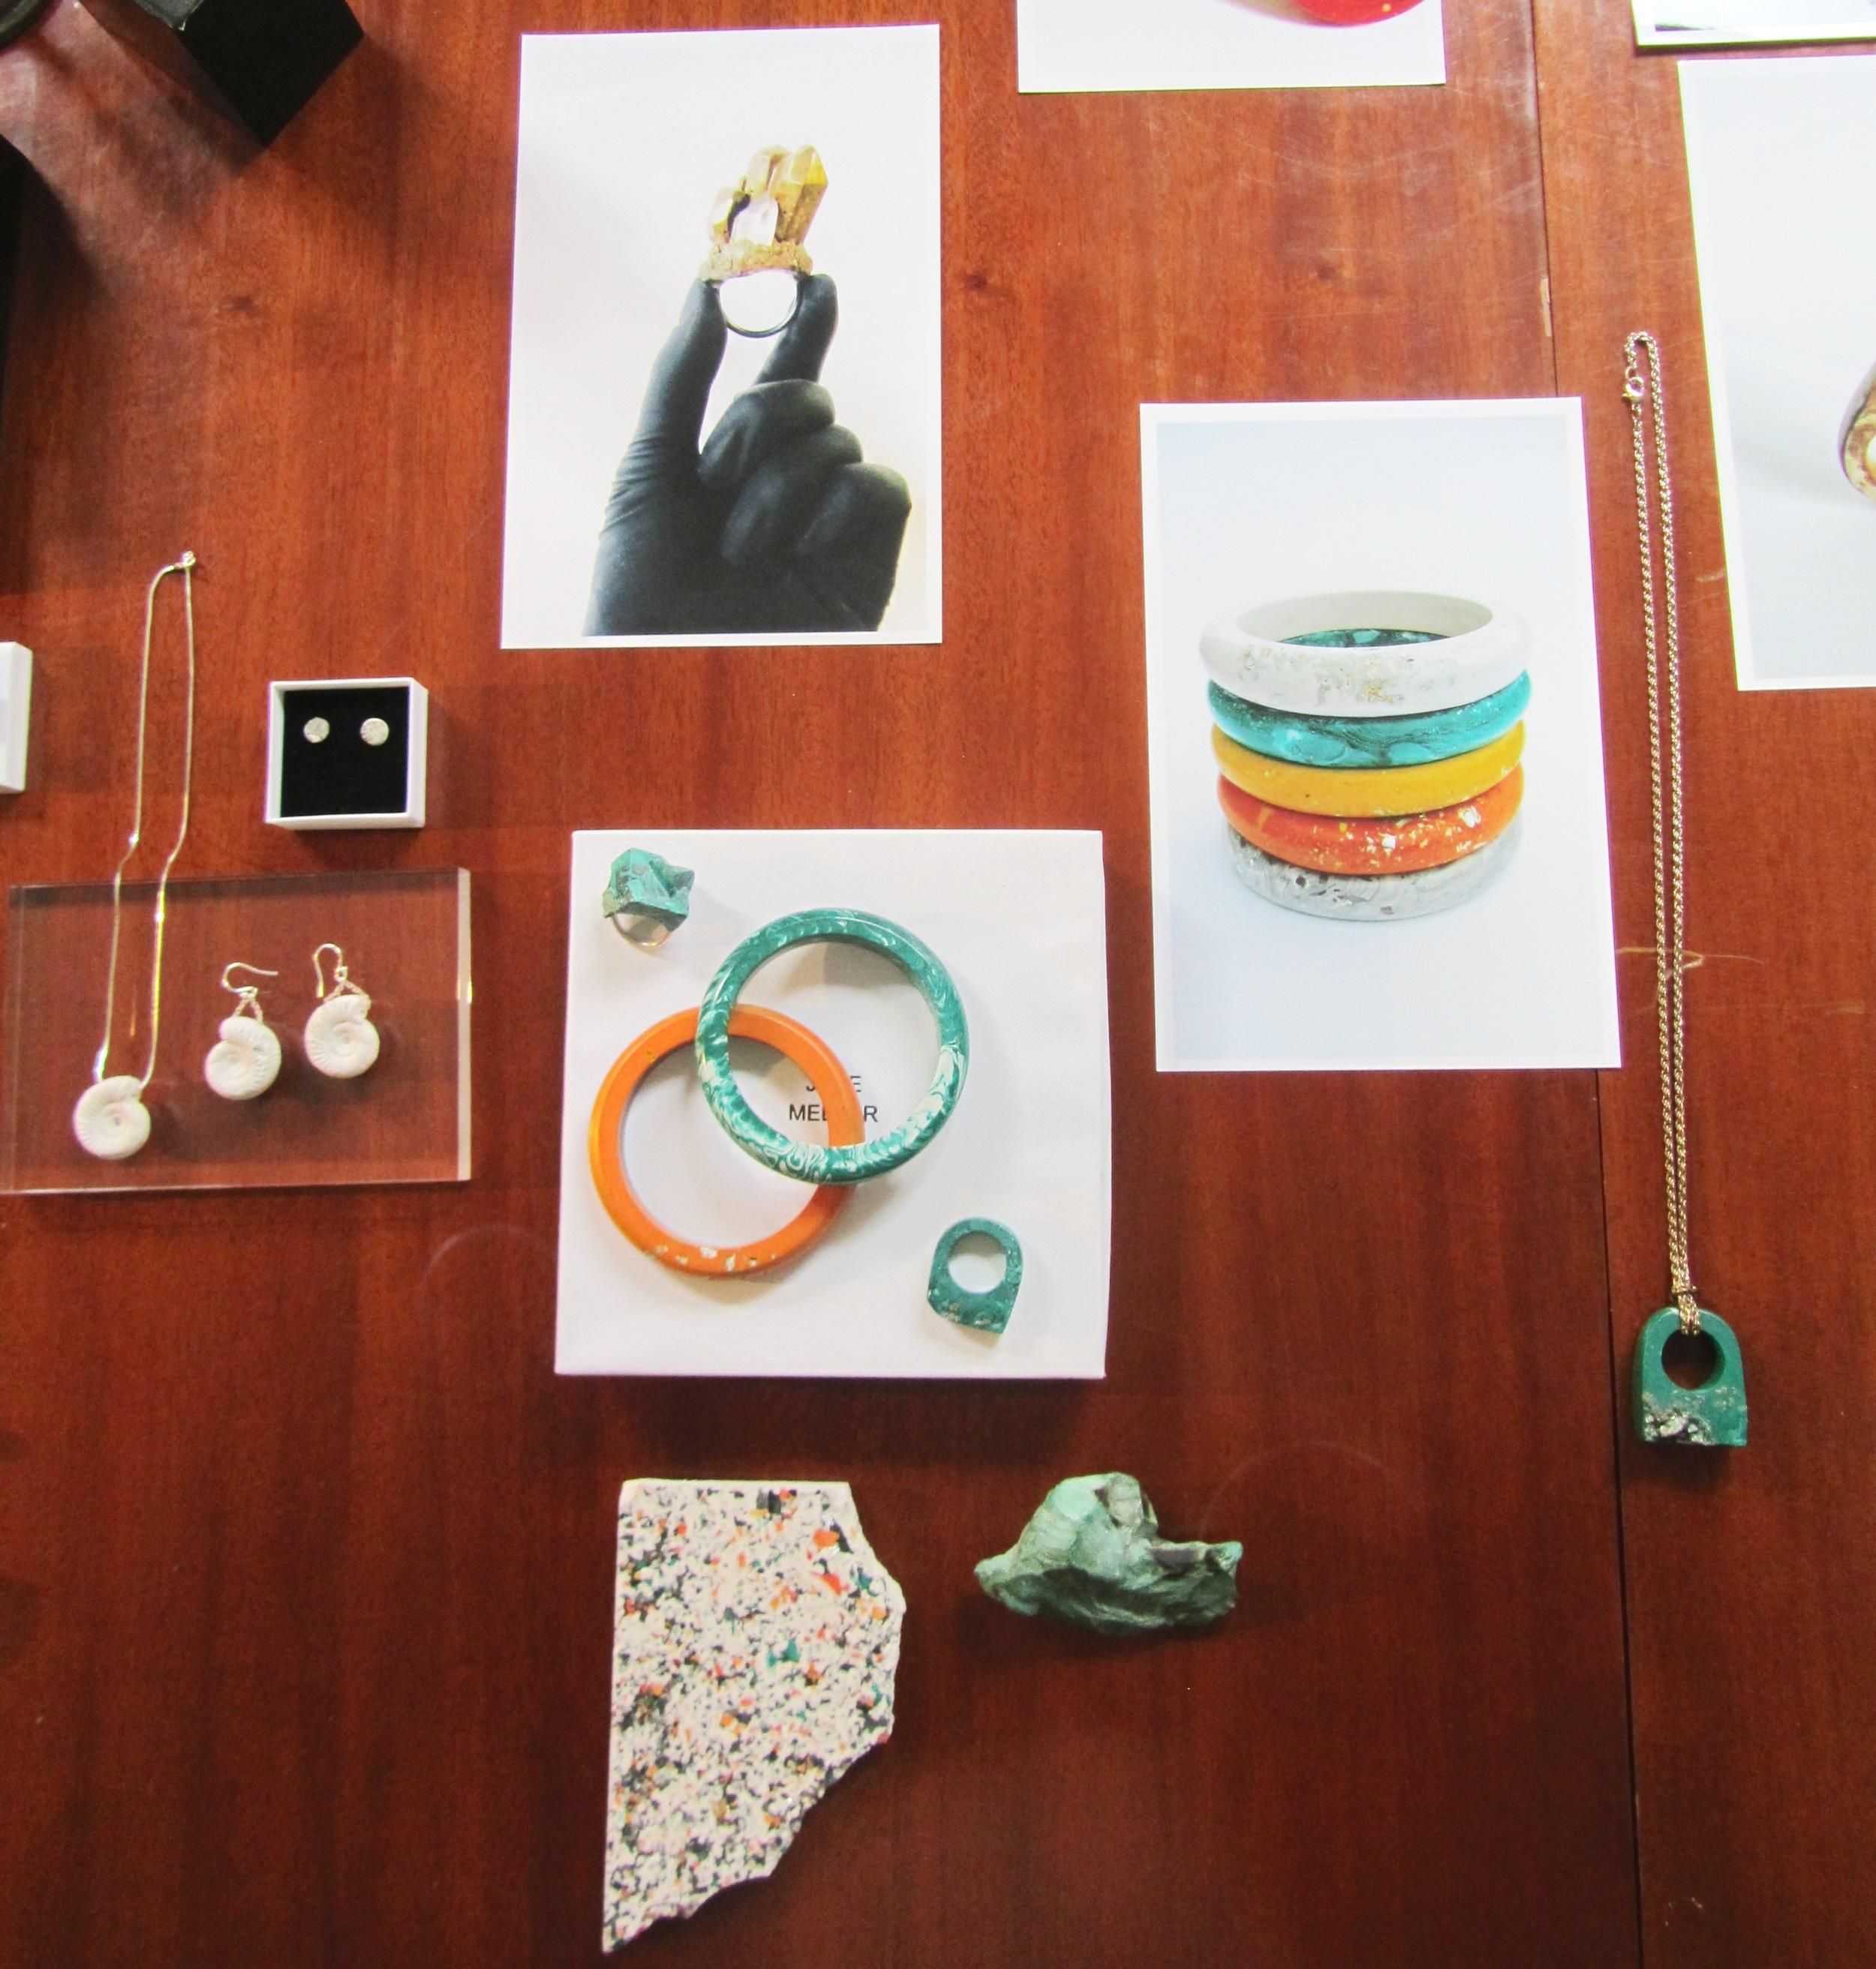 jade mellor jewellery soho showcase bangles 2014.JPG